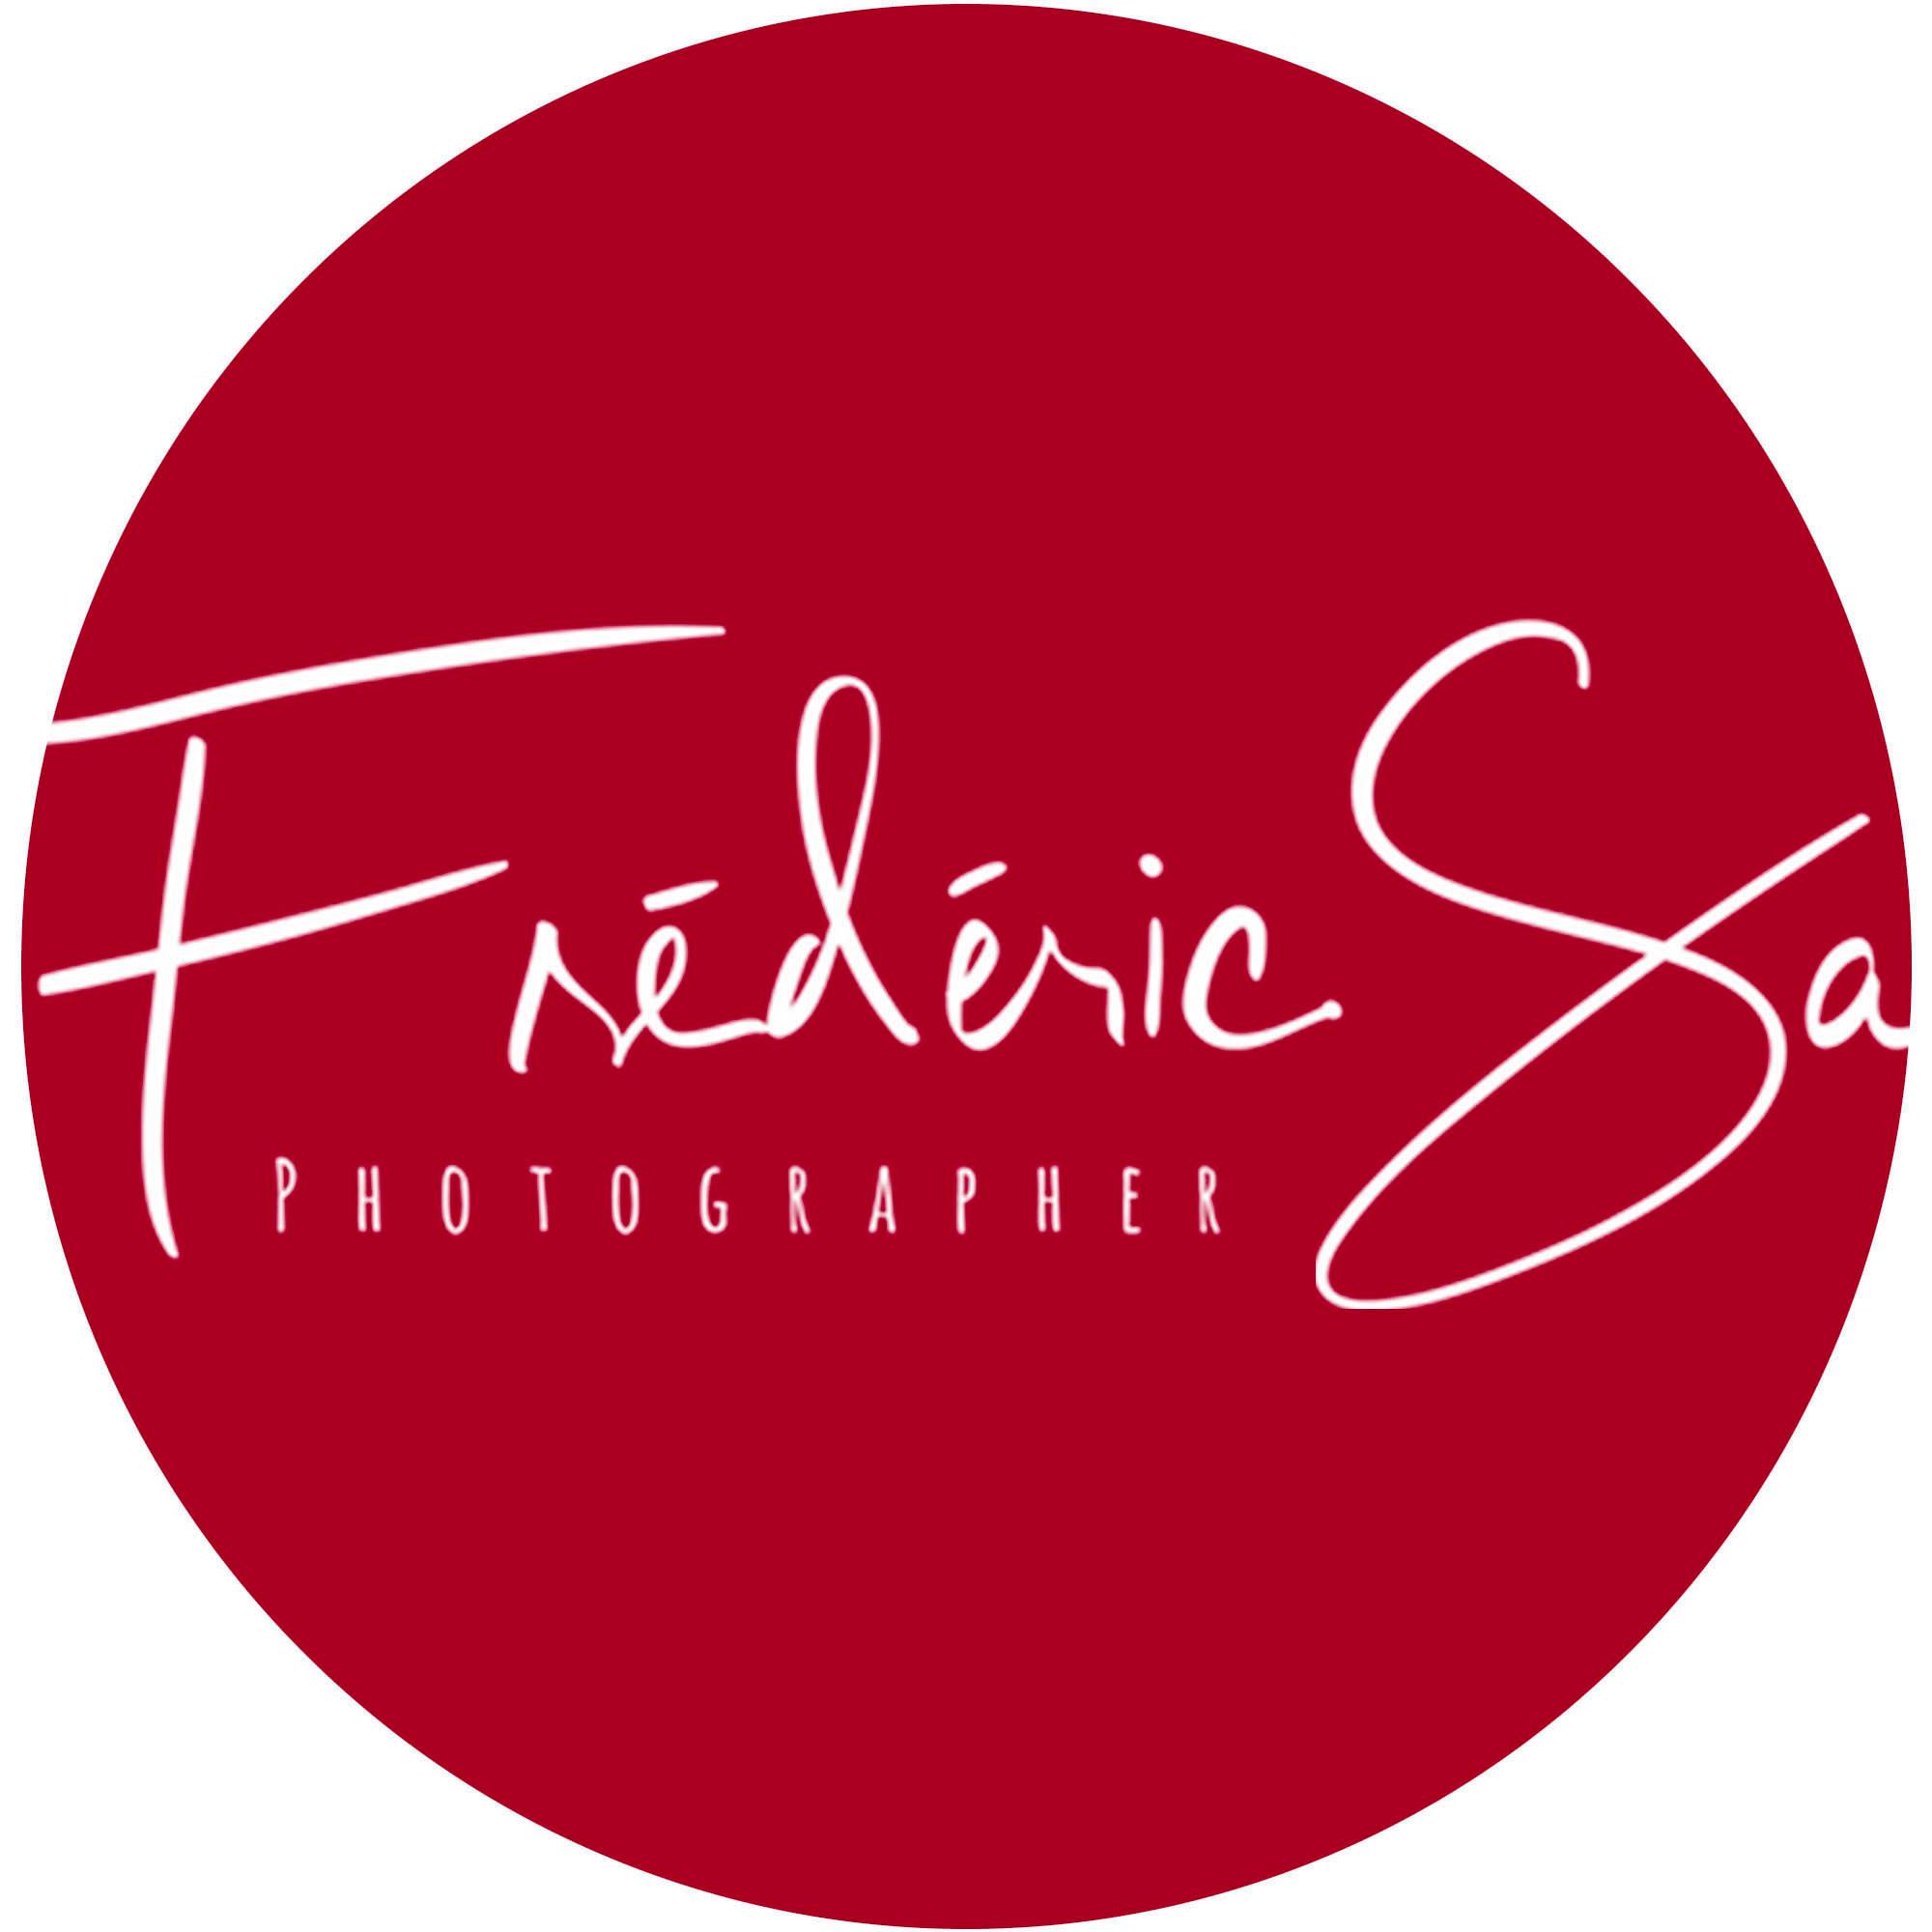 Frederic Saez